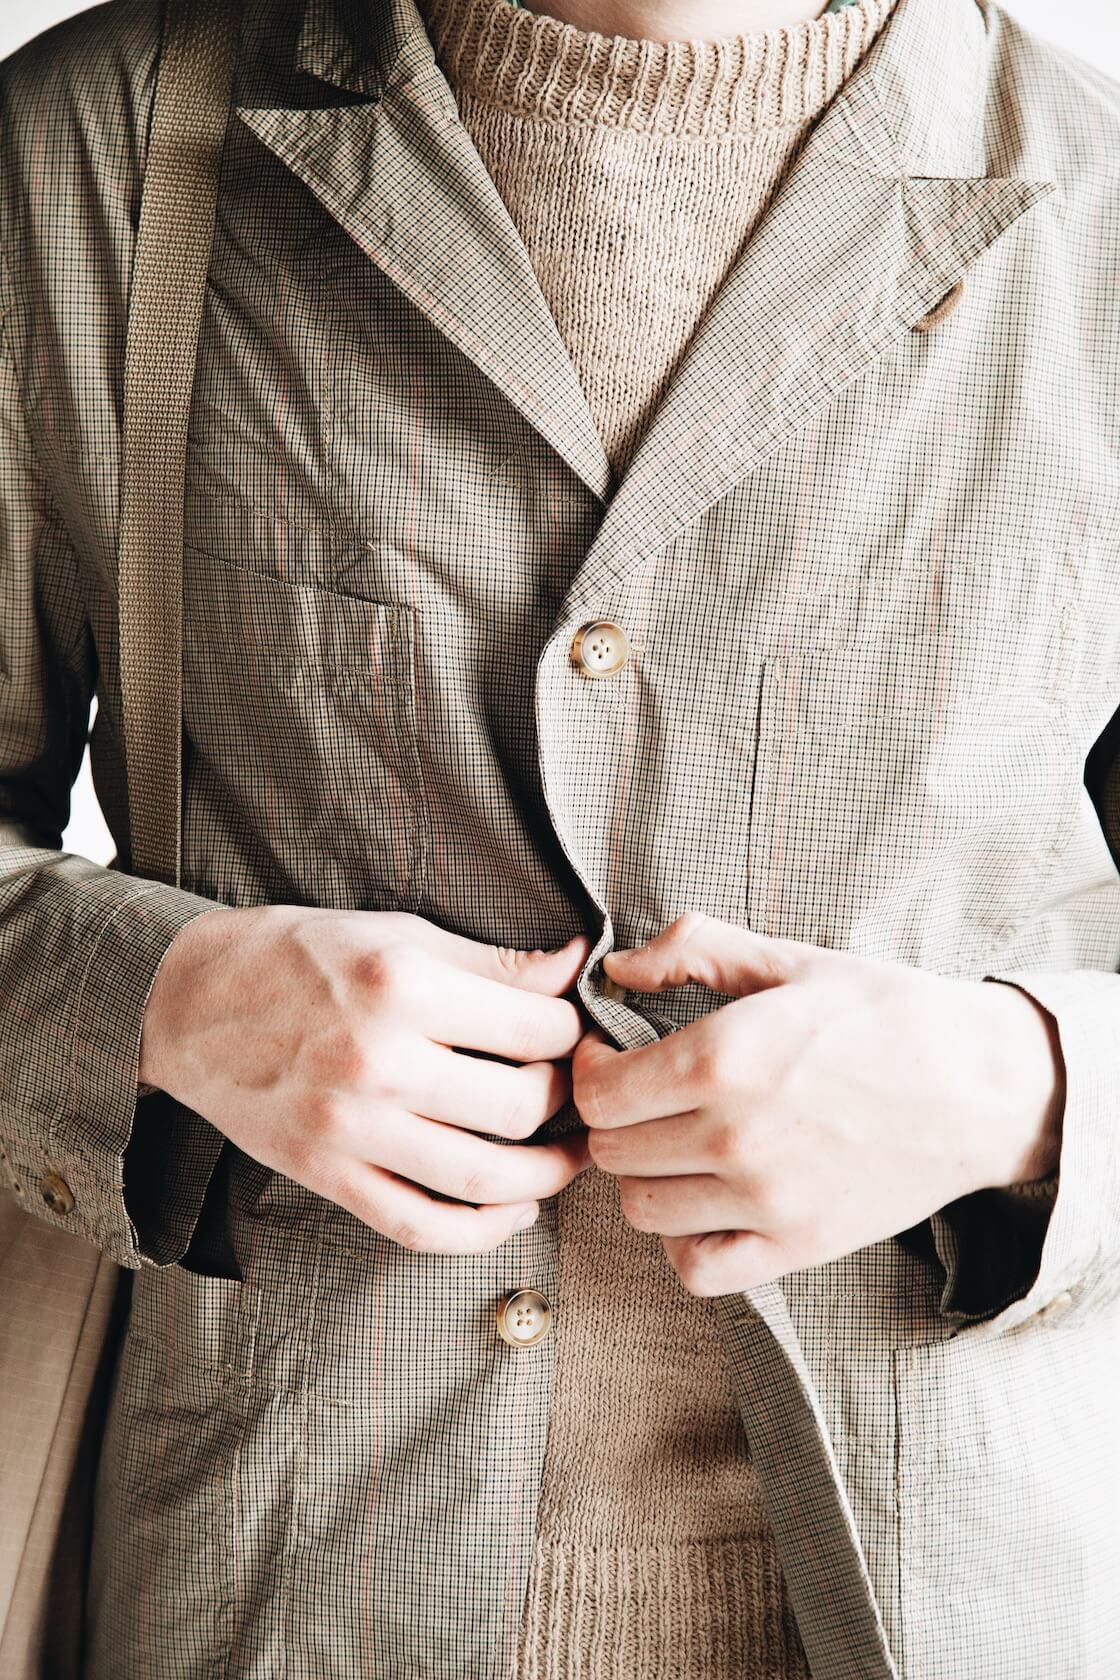 engineered garments new bedford nb jacket on body